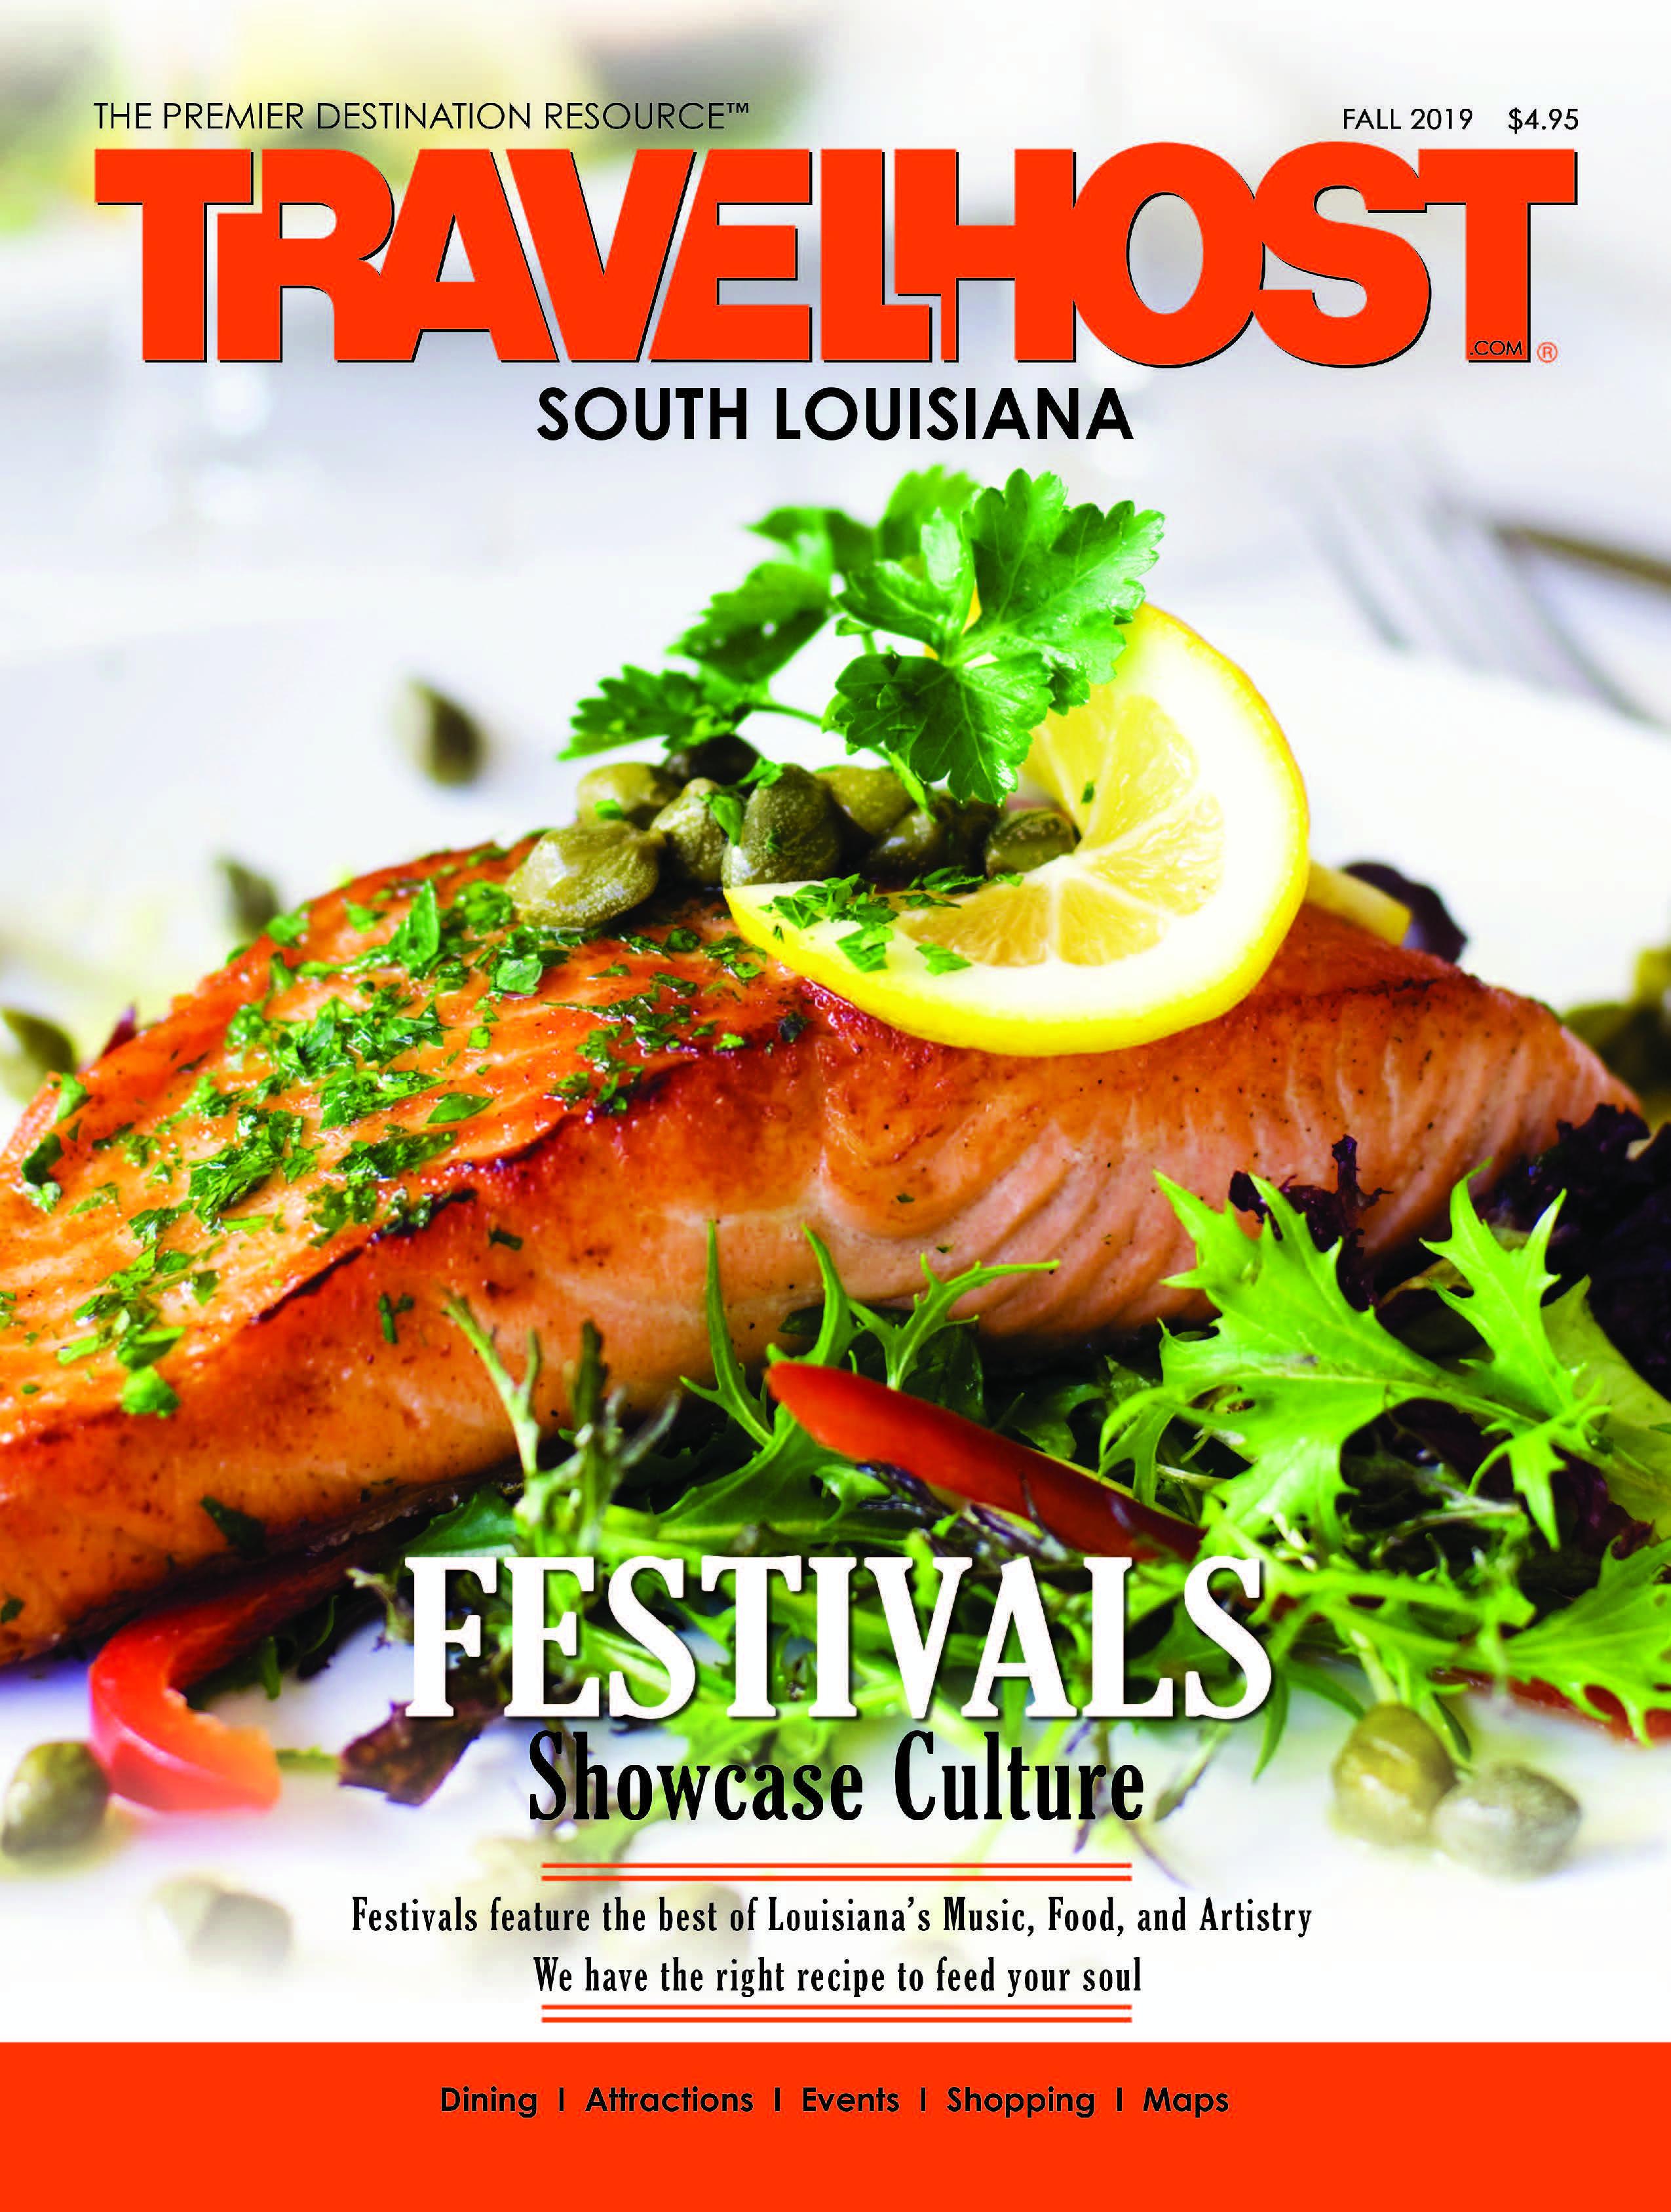 Cdn Travelhost Com In 2020 Louisiana Festivals South Louisiana Fine Dining Restaurant